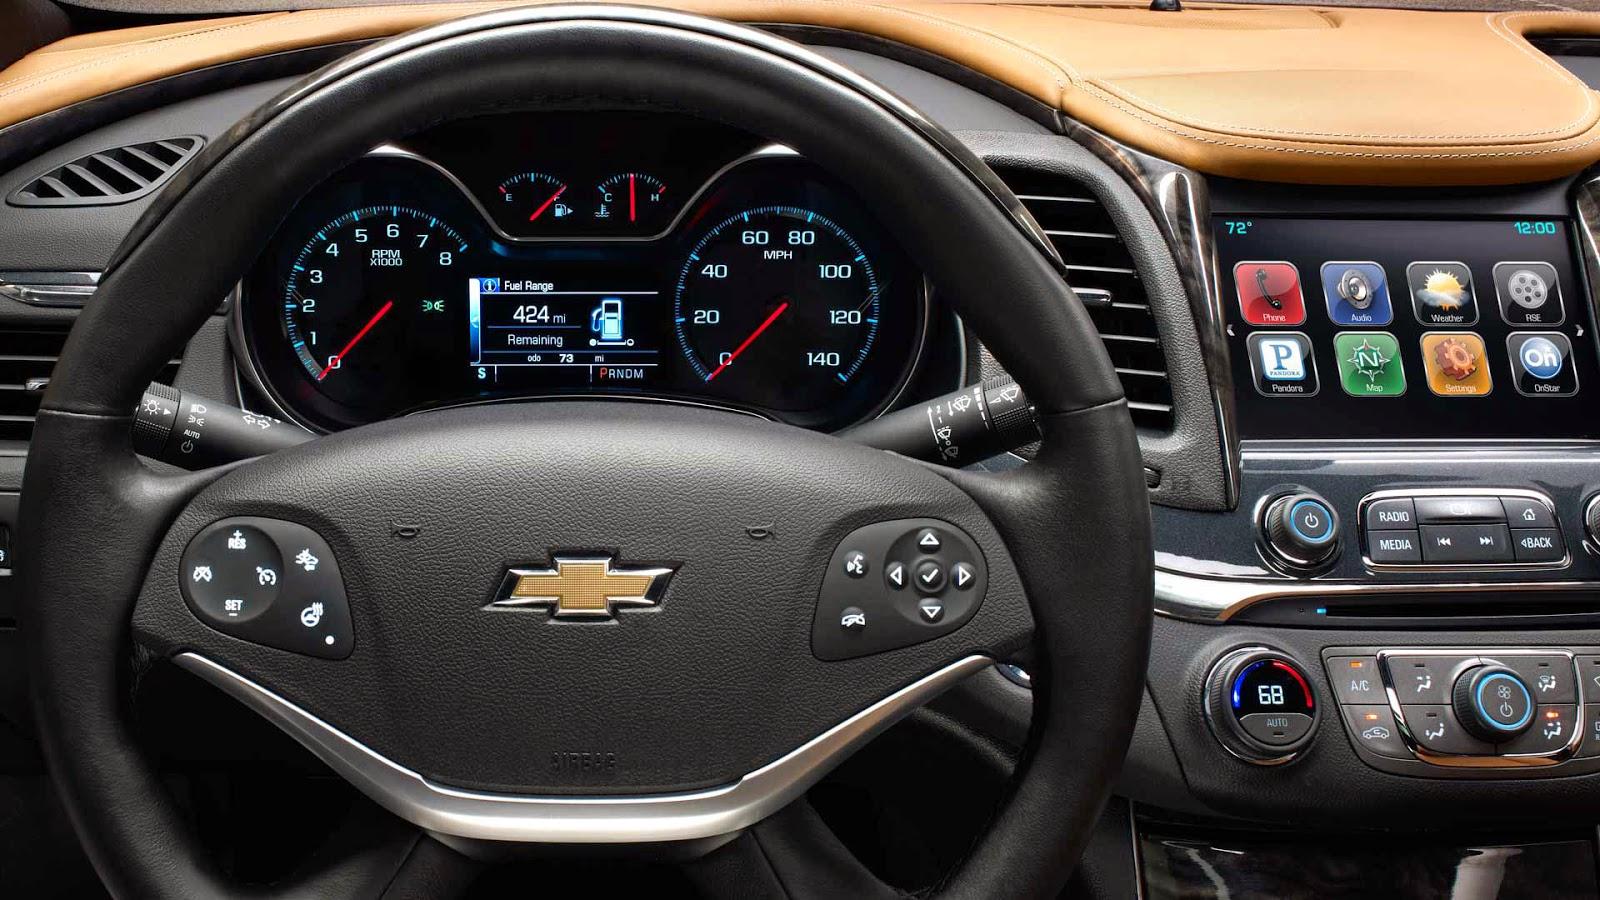 Download link for Chevrolet impala 2015 interior